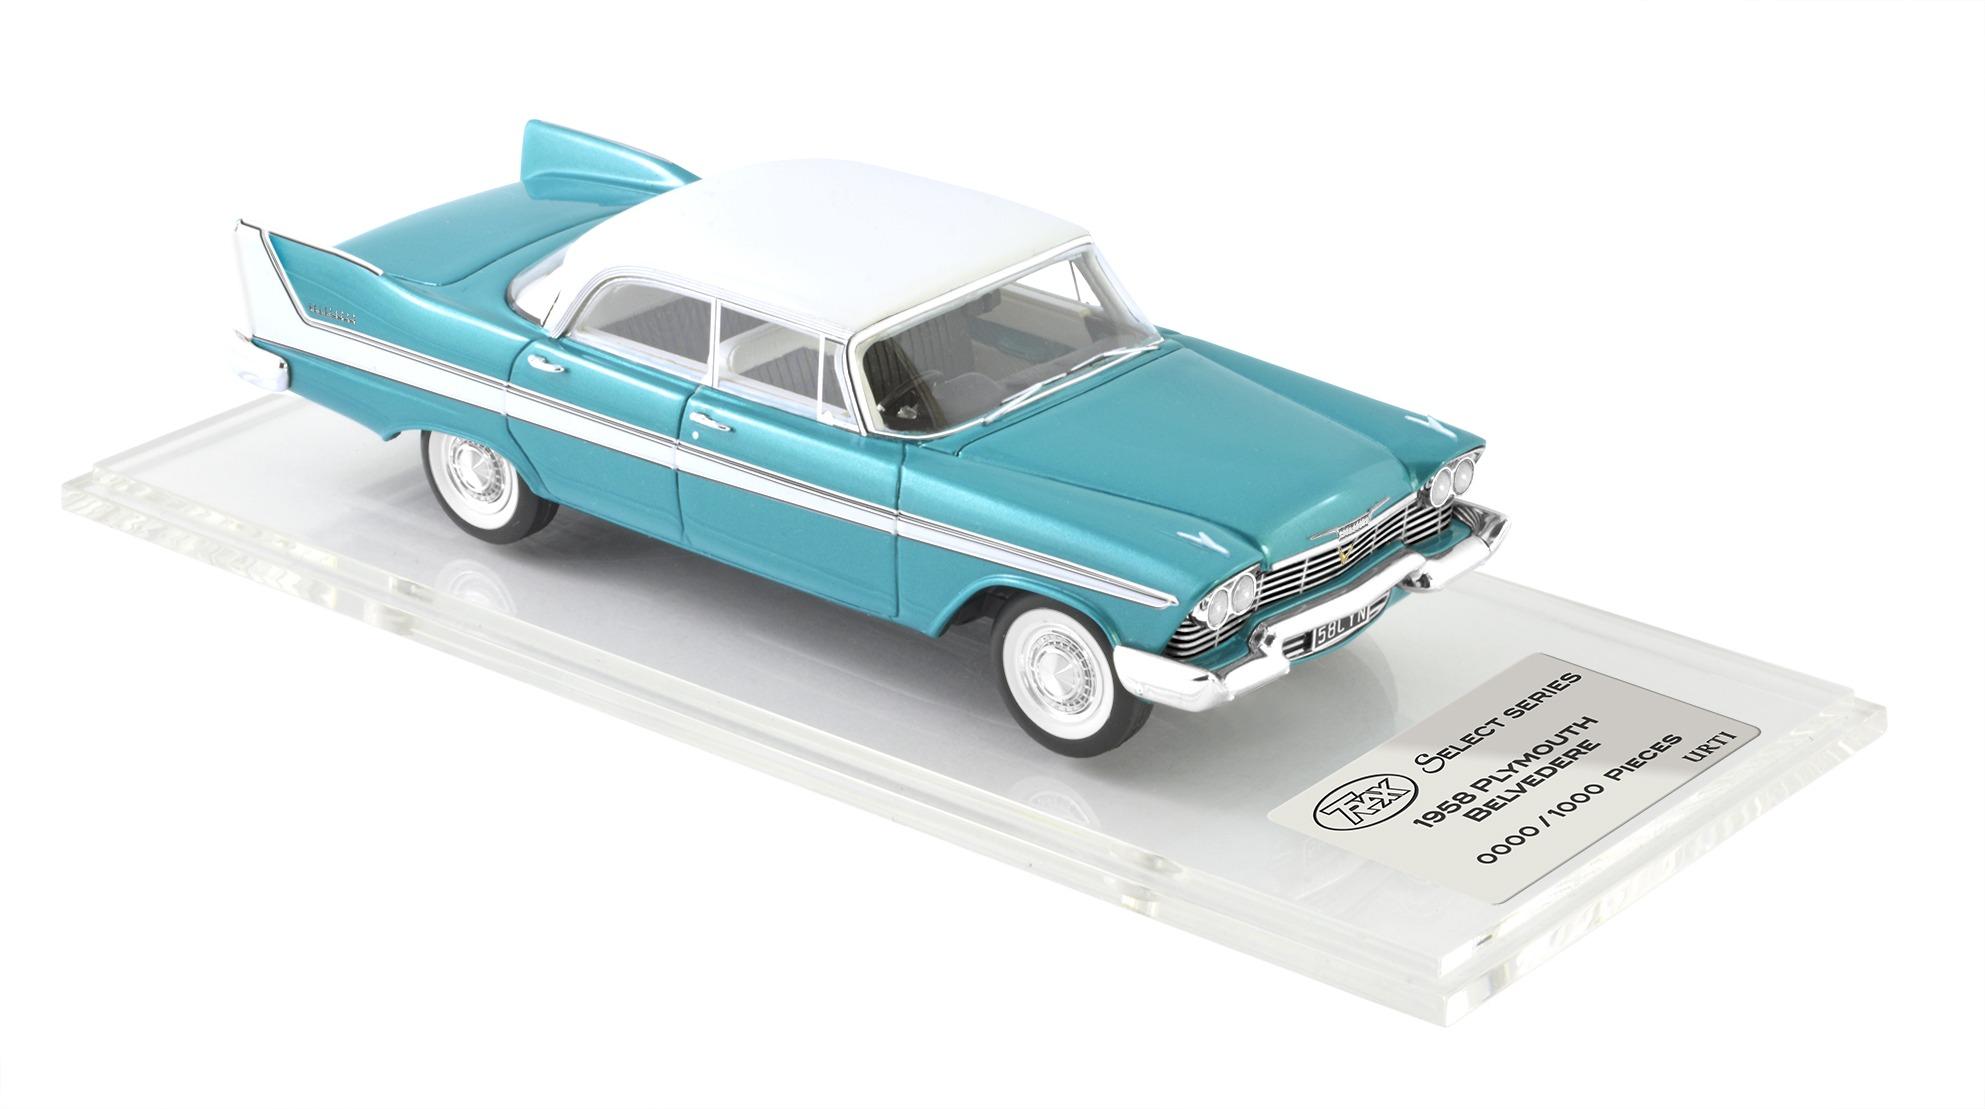 1958 Plymouth Belvedere Hardtop 4 Door – Turquoise / White